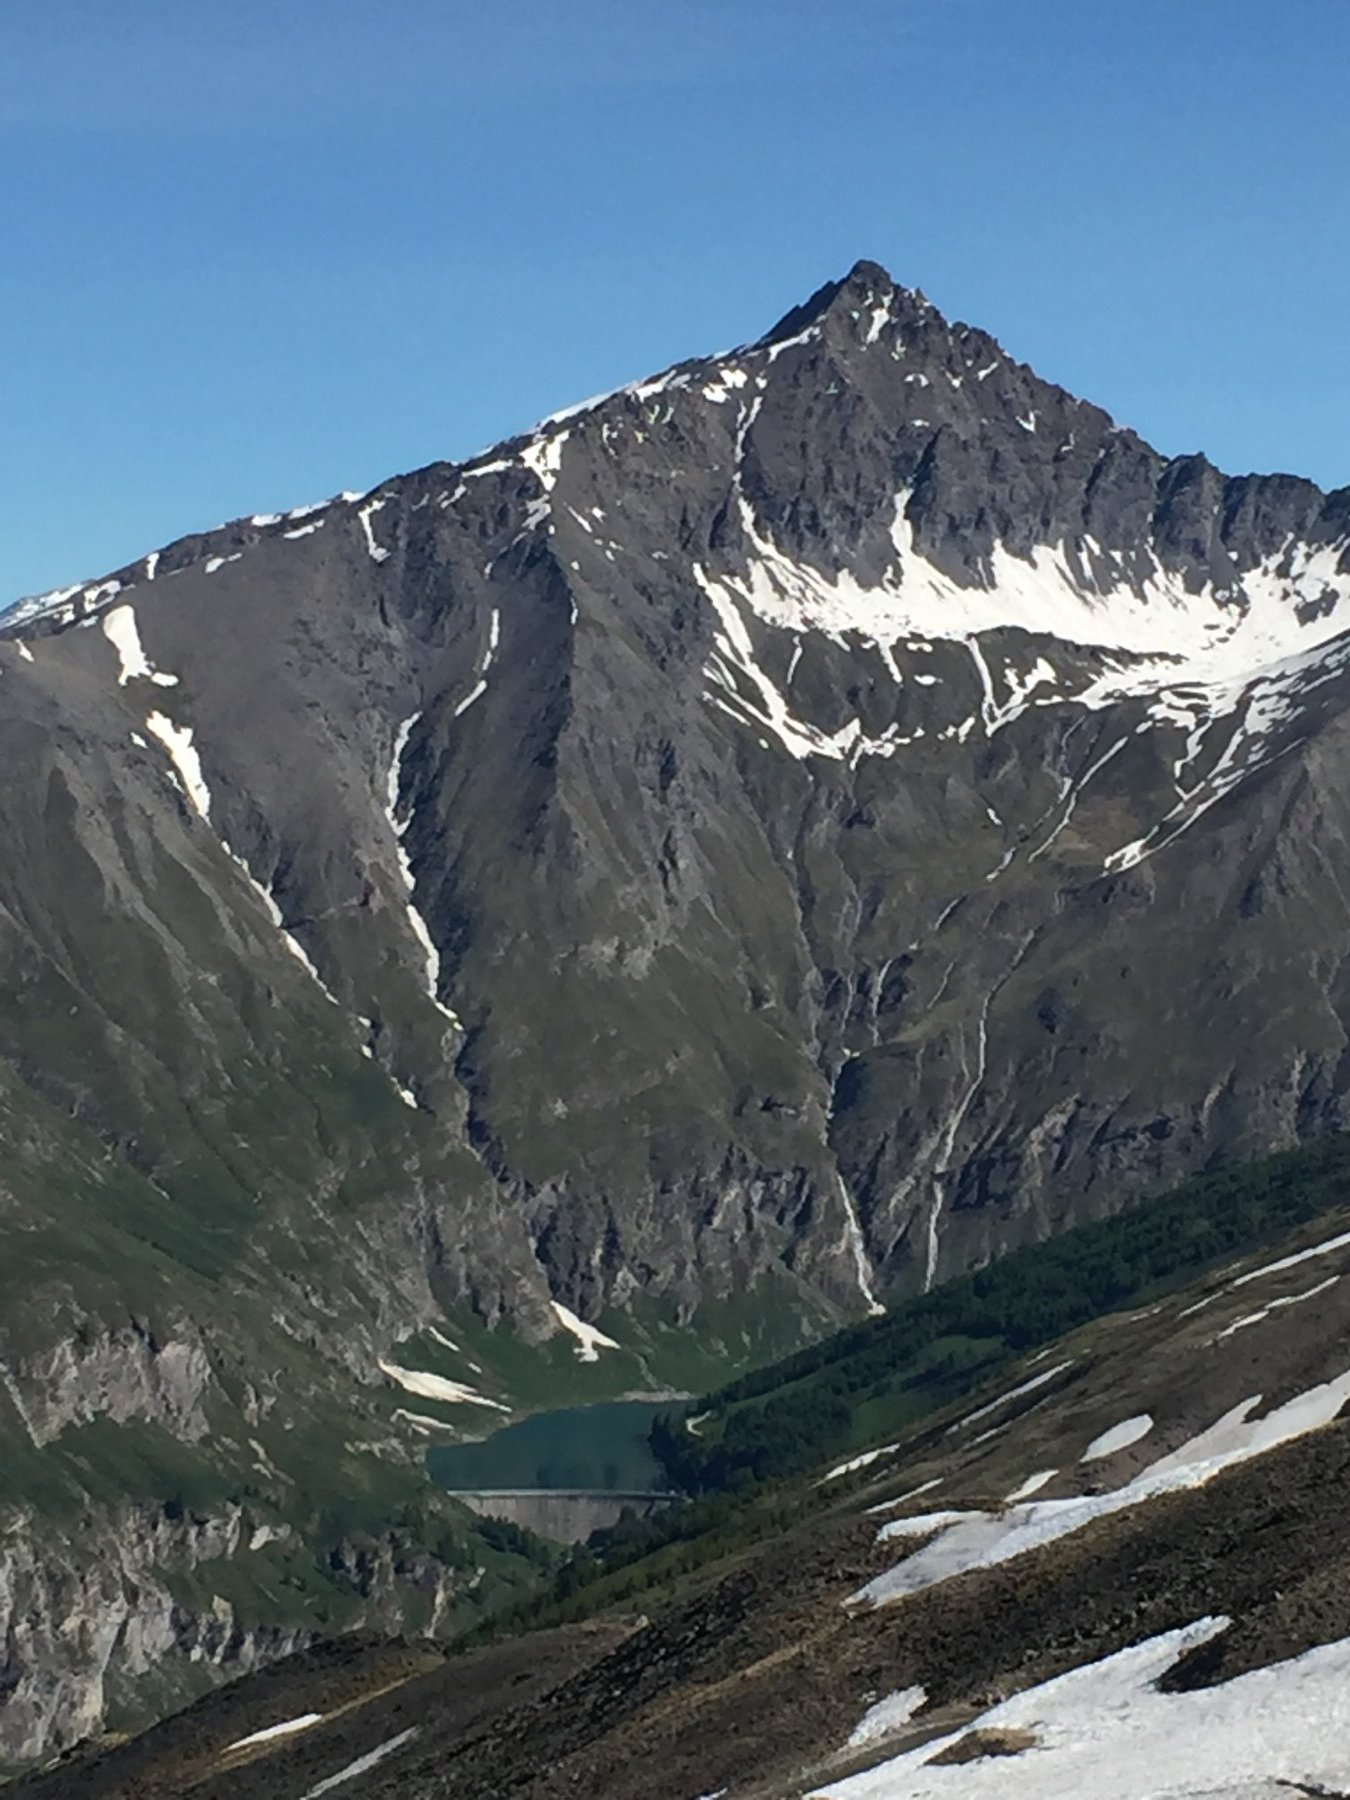 La diga di Rochemolles